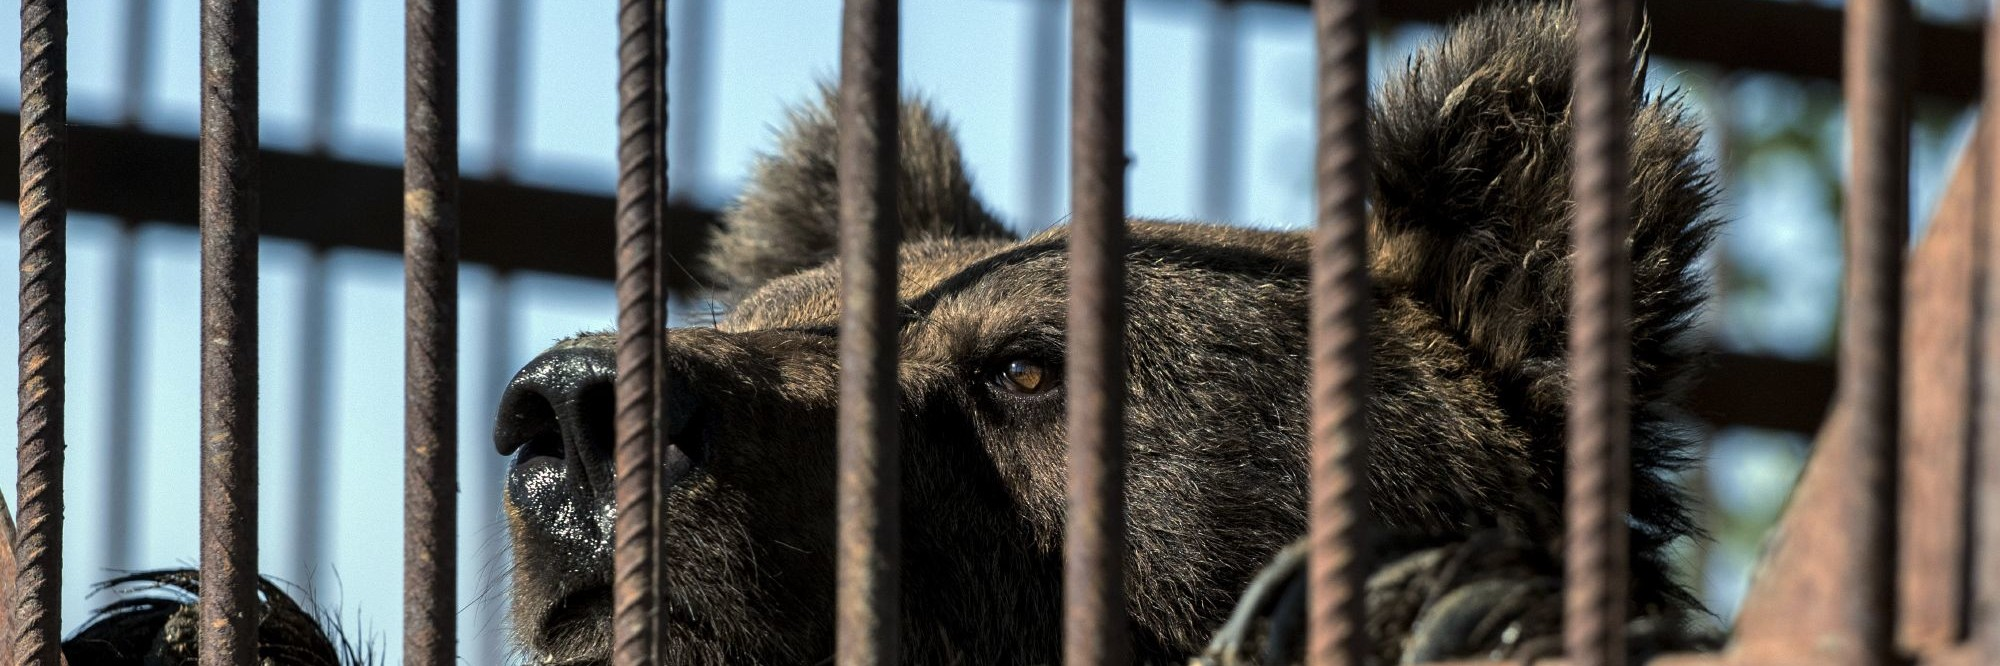 Bären in Serbien